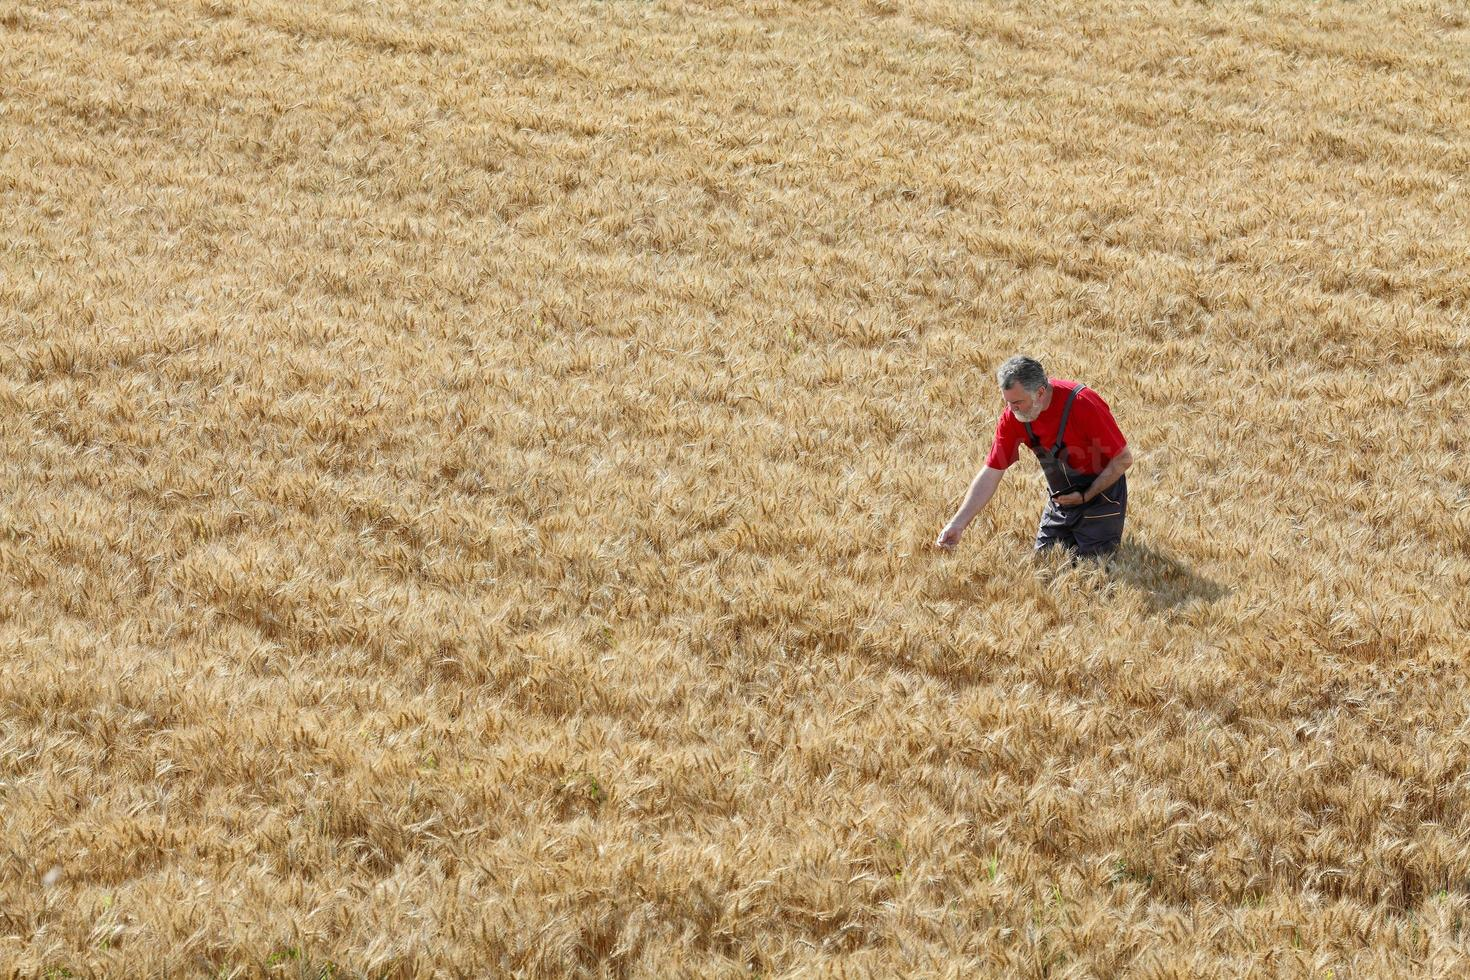 Escena agrícola, agricultor o agrónomo inspeccionar campo de trigo foto